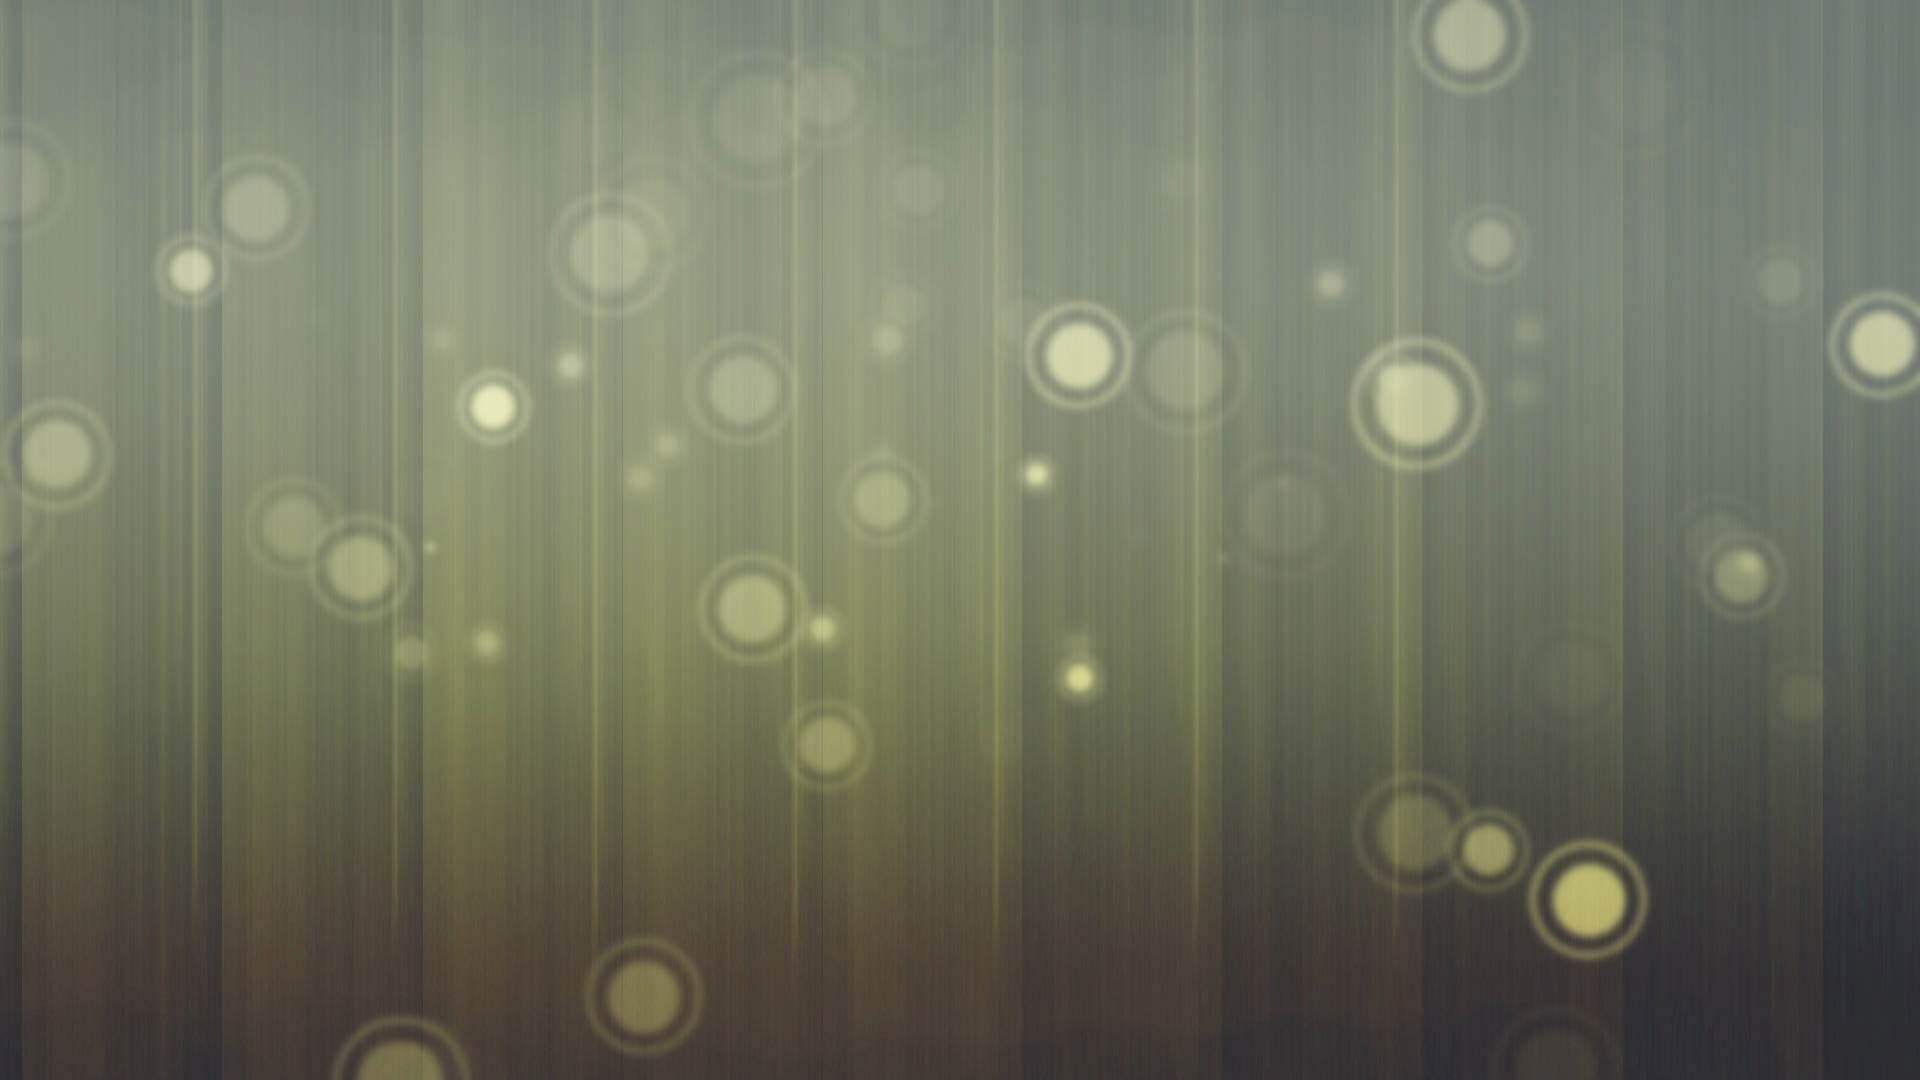 wallpaper: abstract hd wallpapers 2